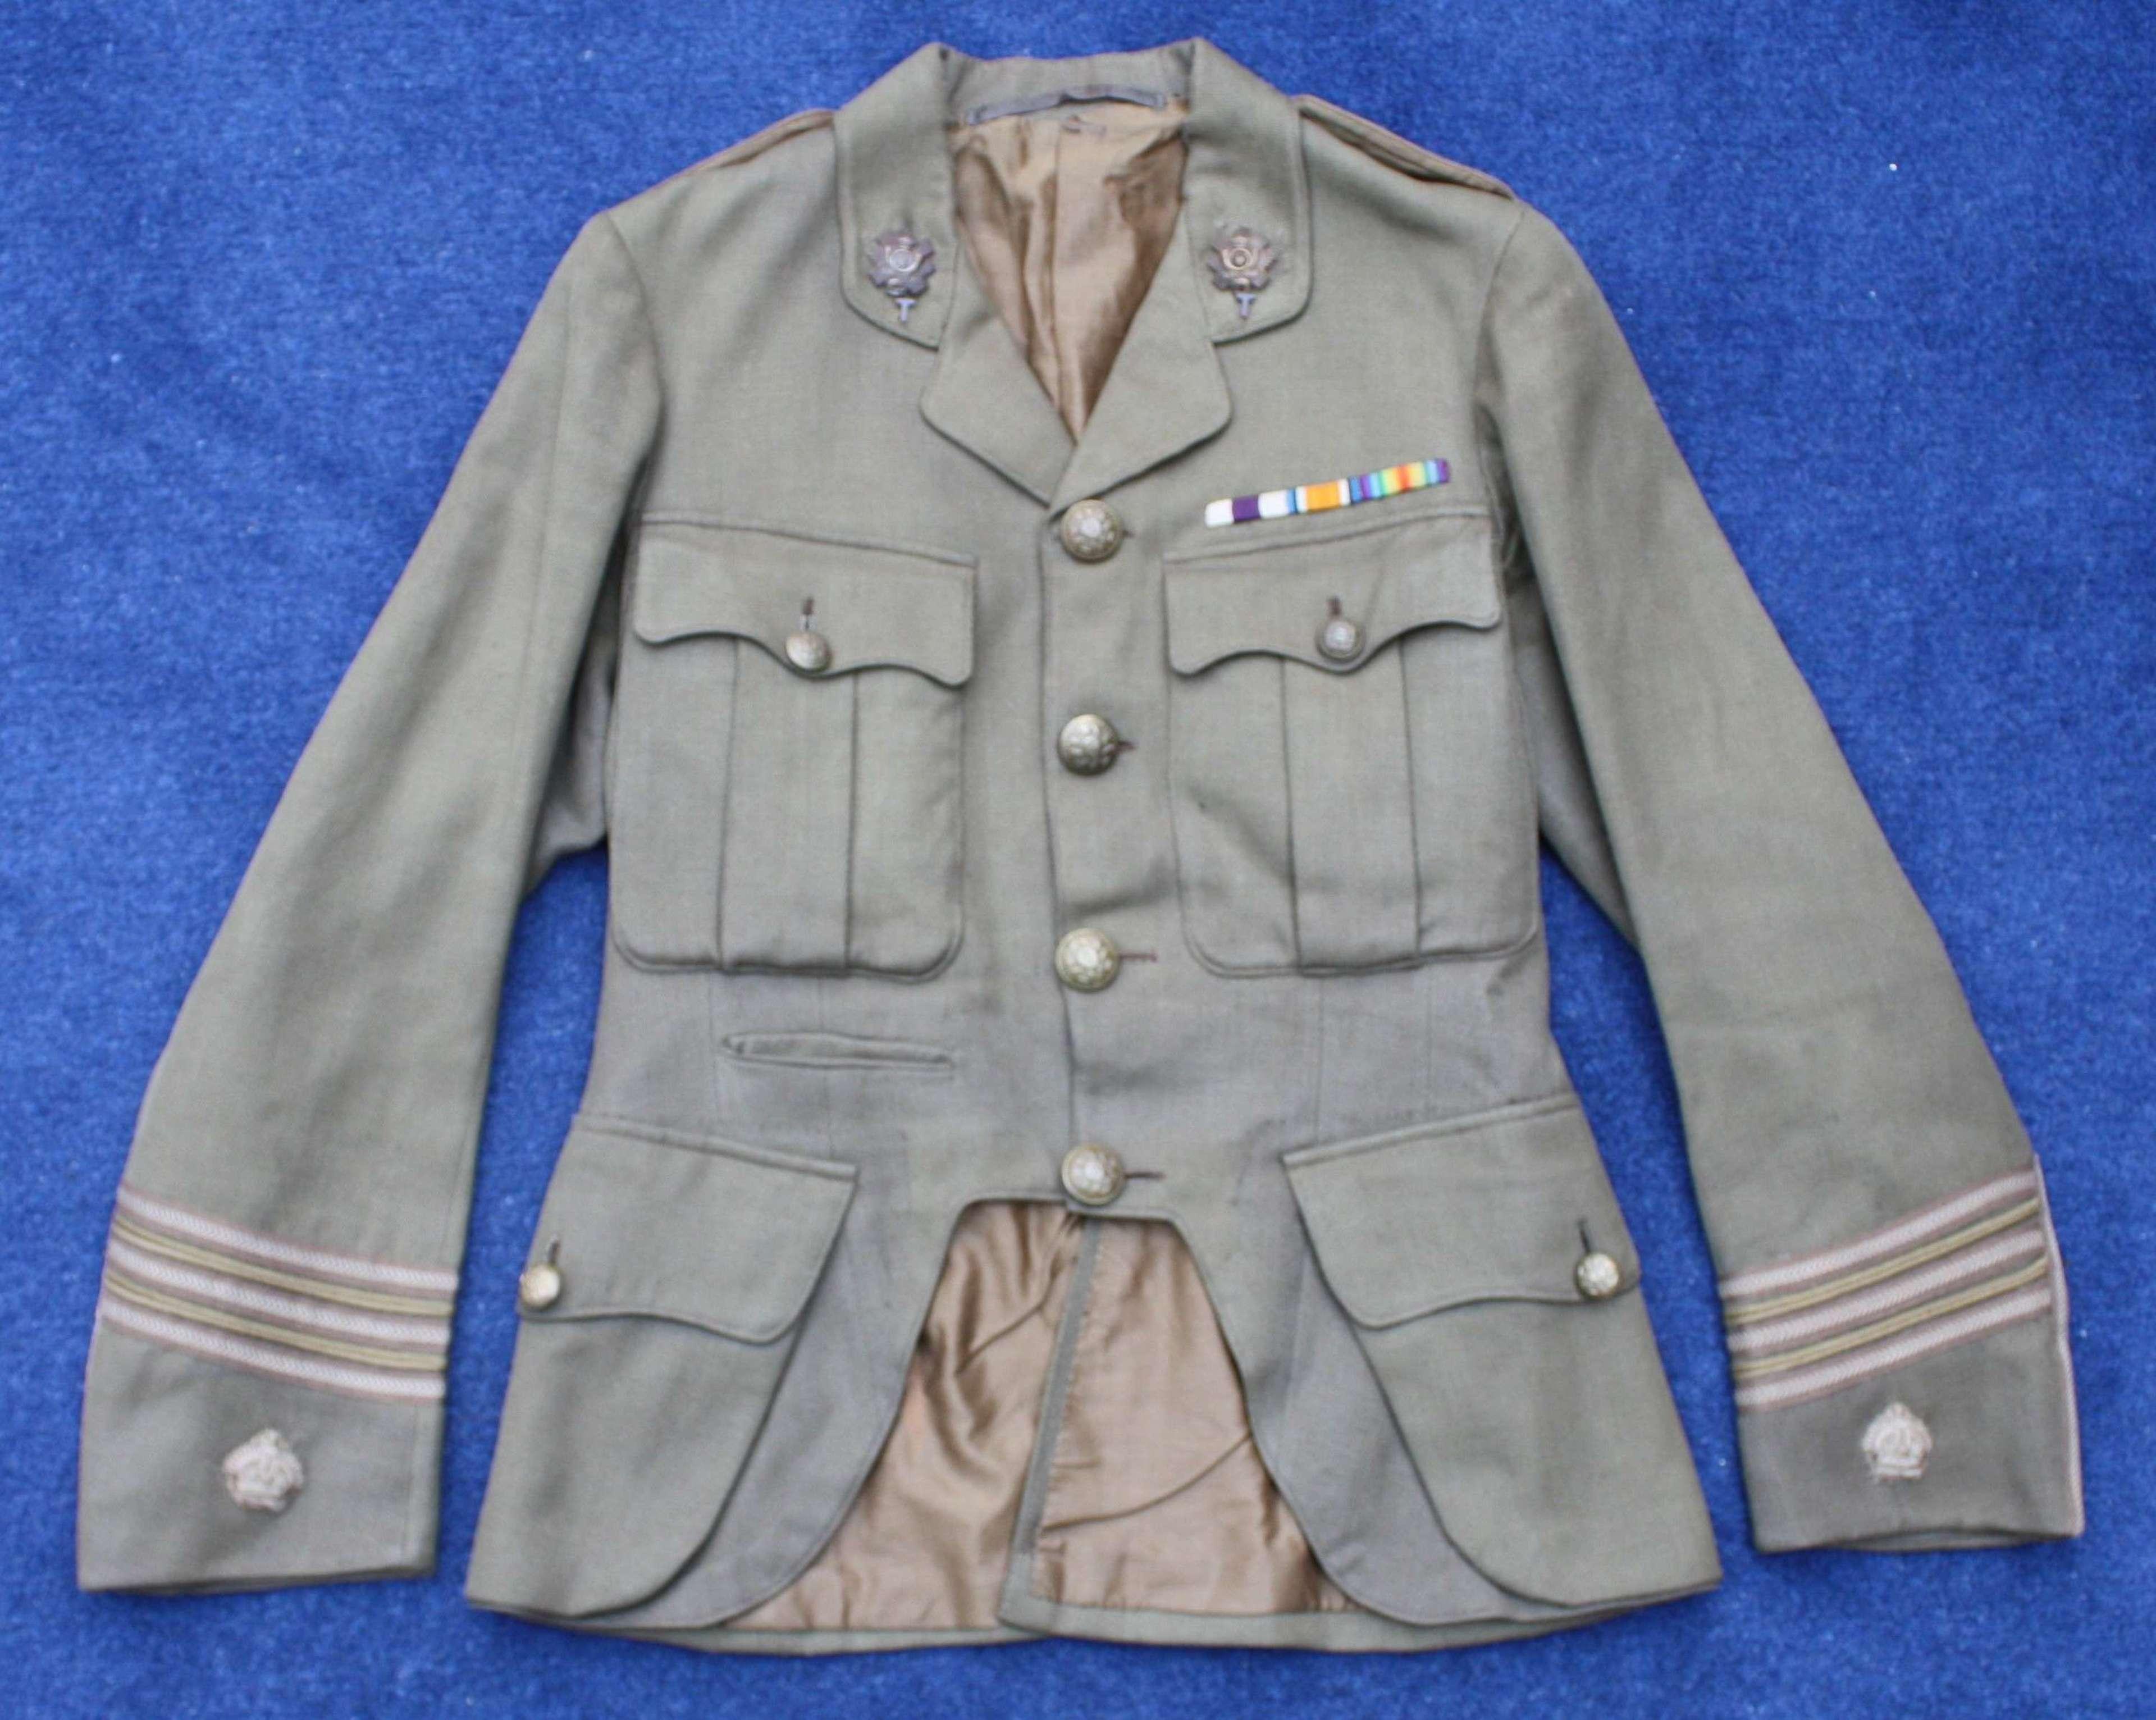 WW1 BRITISH ARMY MAJOR'S CUFF RANK TUNIC HIGHLAND LIGHT INFANTRY